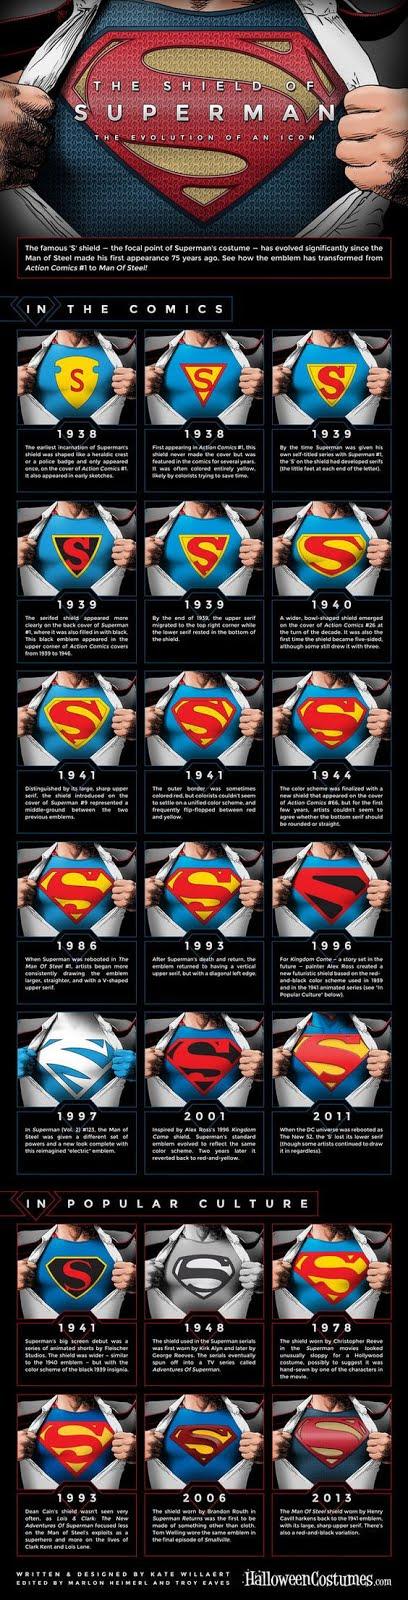 DC Comics, Superman, Terra de Nerd,